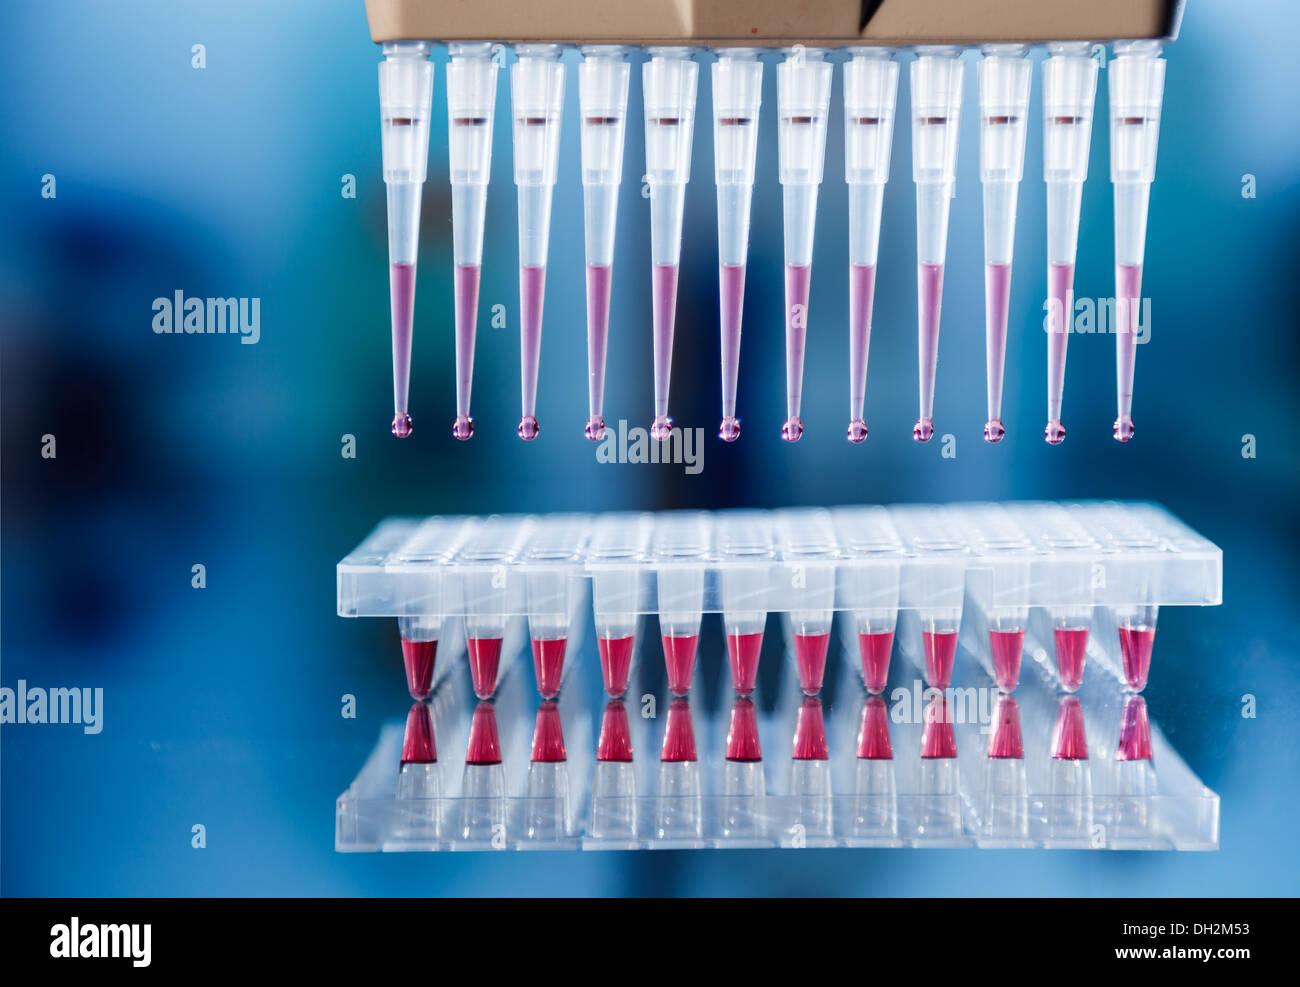 Paternity test method of genetic analysis - Stock Image